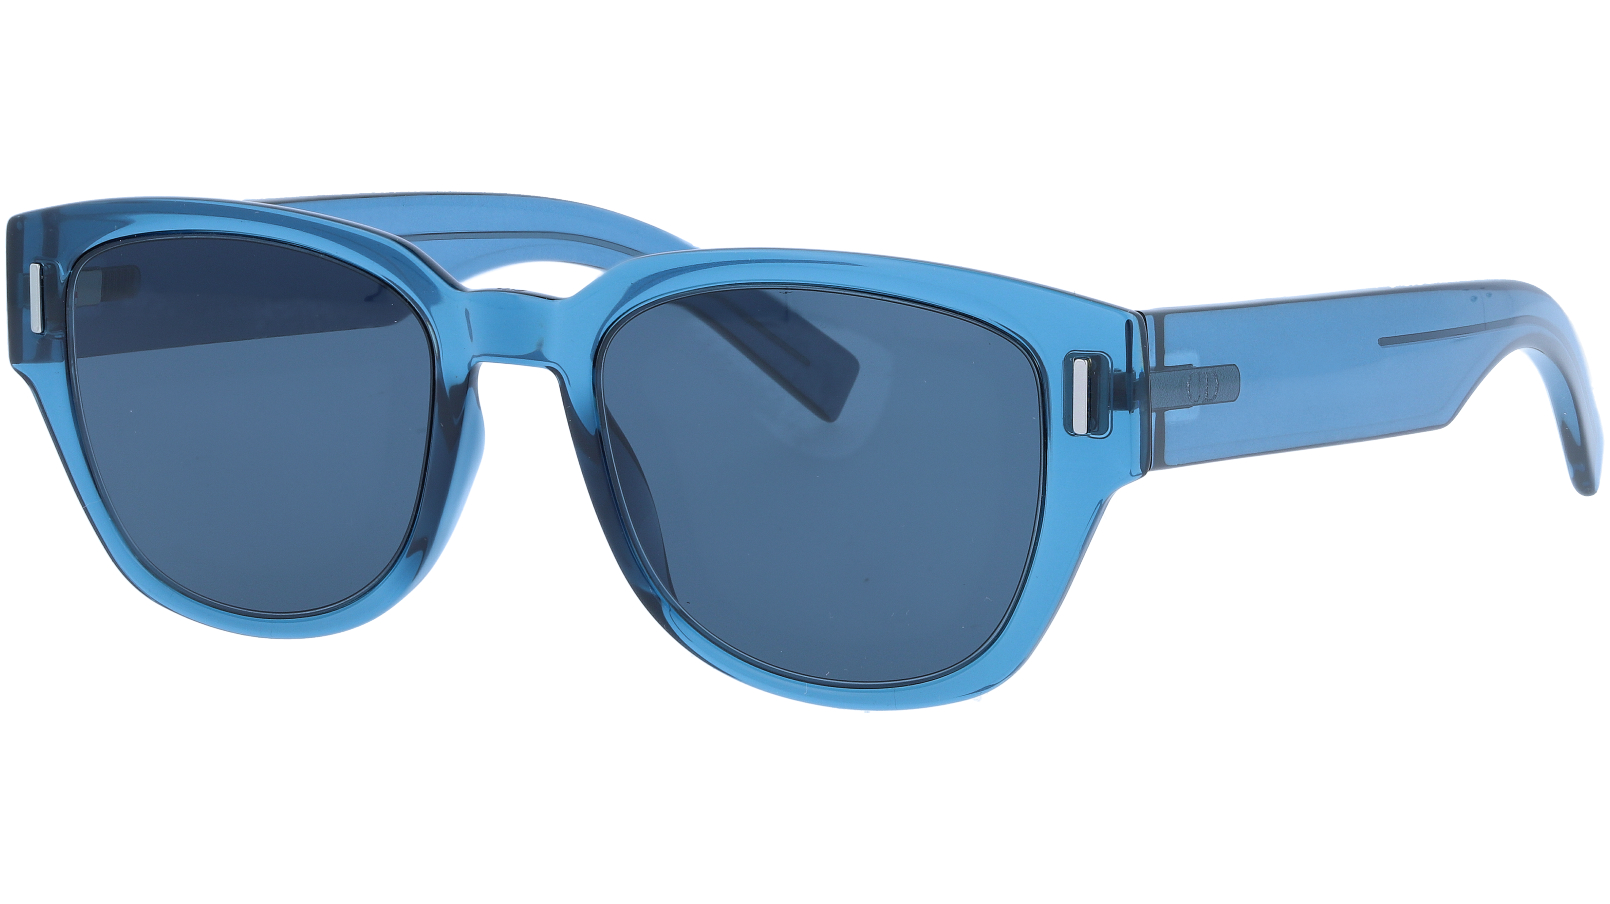 Dior FRACTION3 8072K 50 Black Sunglasses